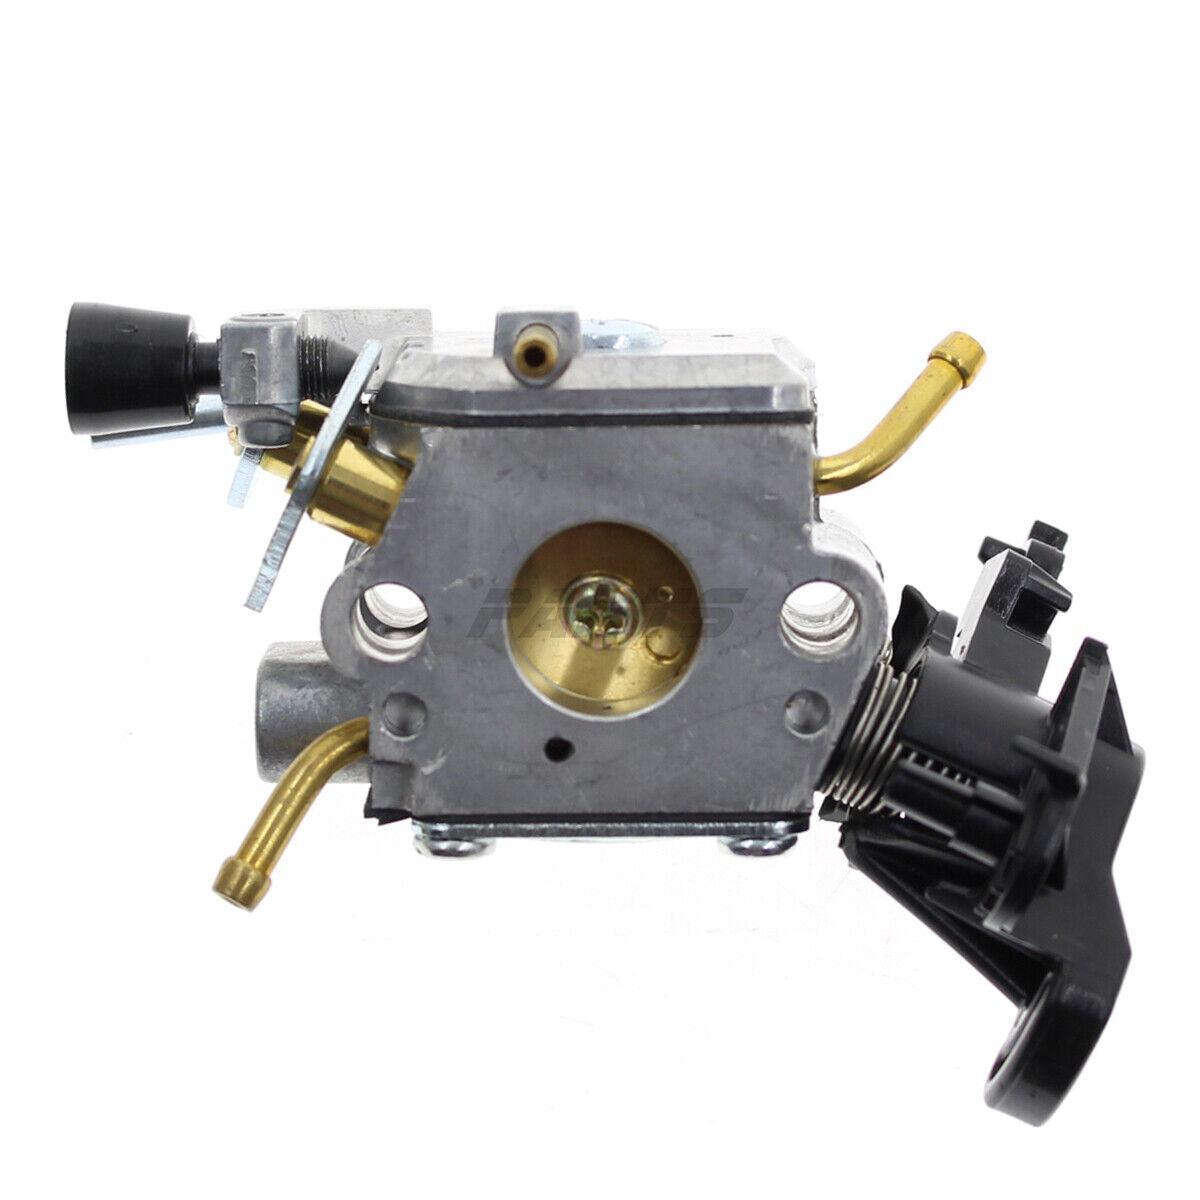 Carburetor for JONSERED CS2245 S II McCULLOCH CS450 966631713 966631715 96663171